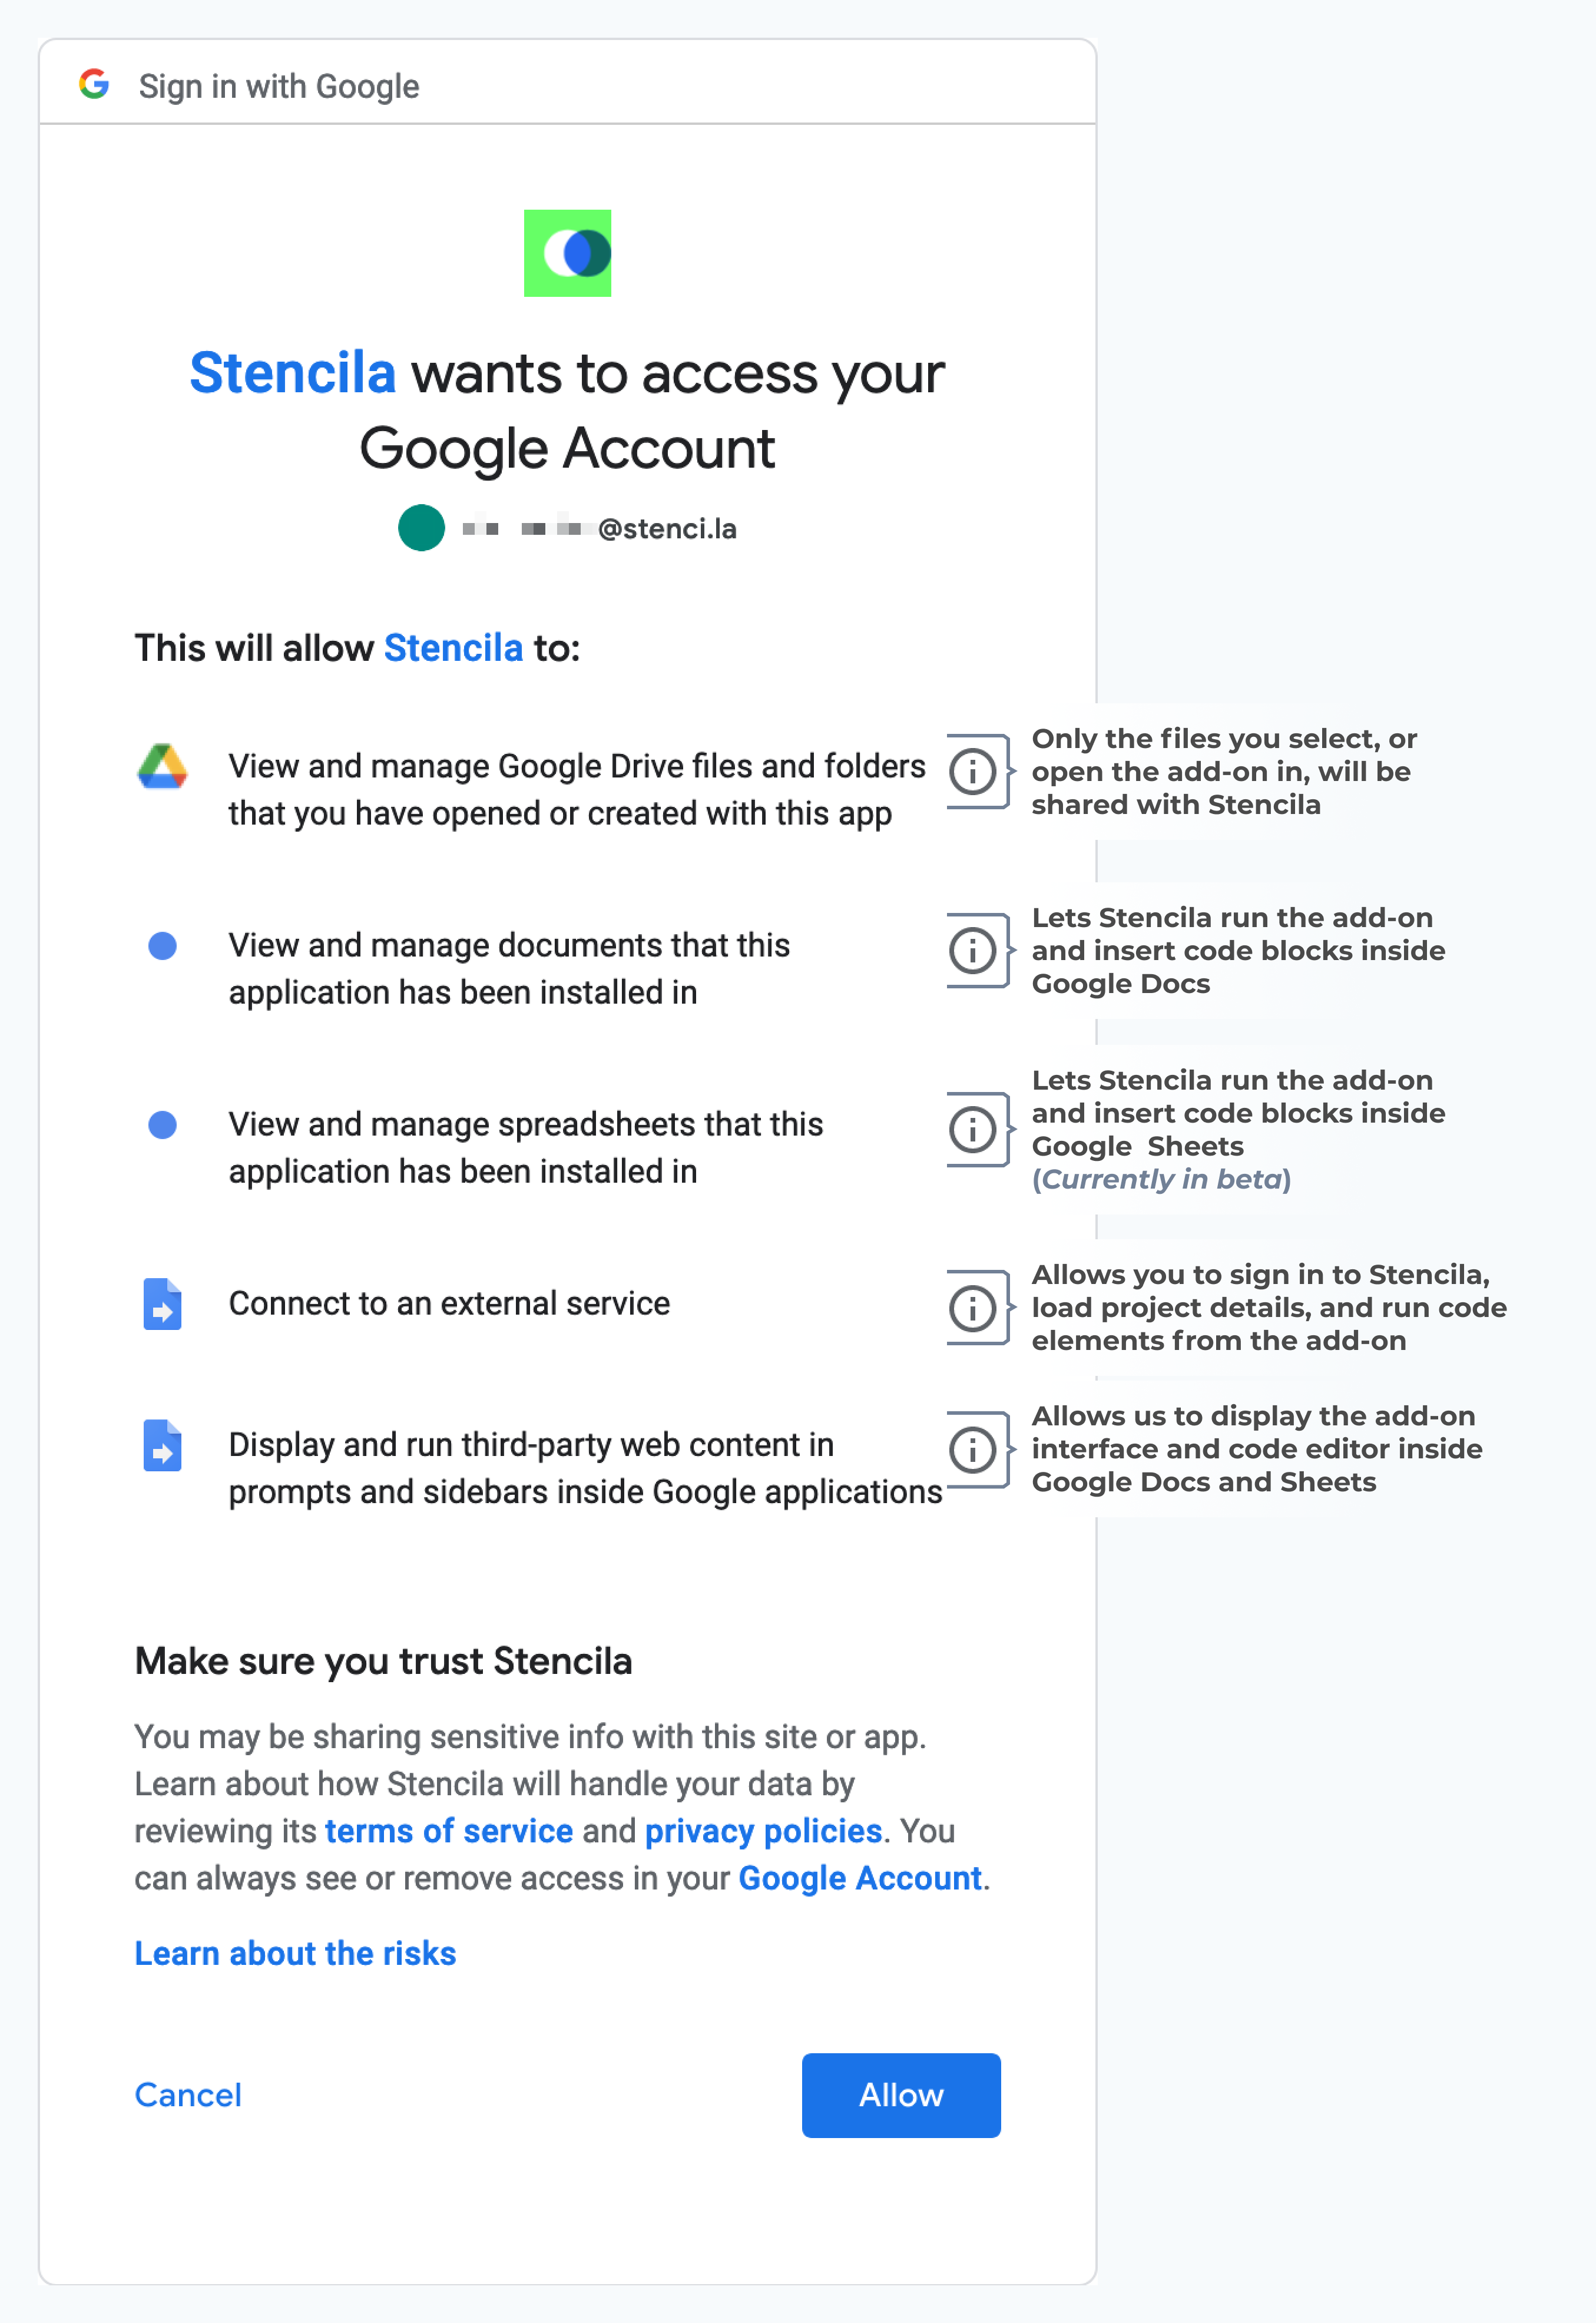 Stencila for Google Docs Permissions request